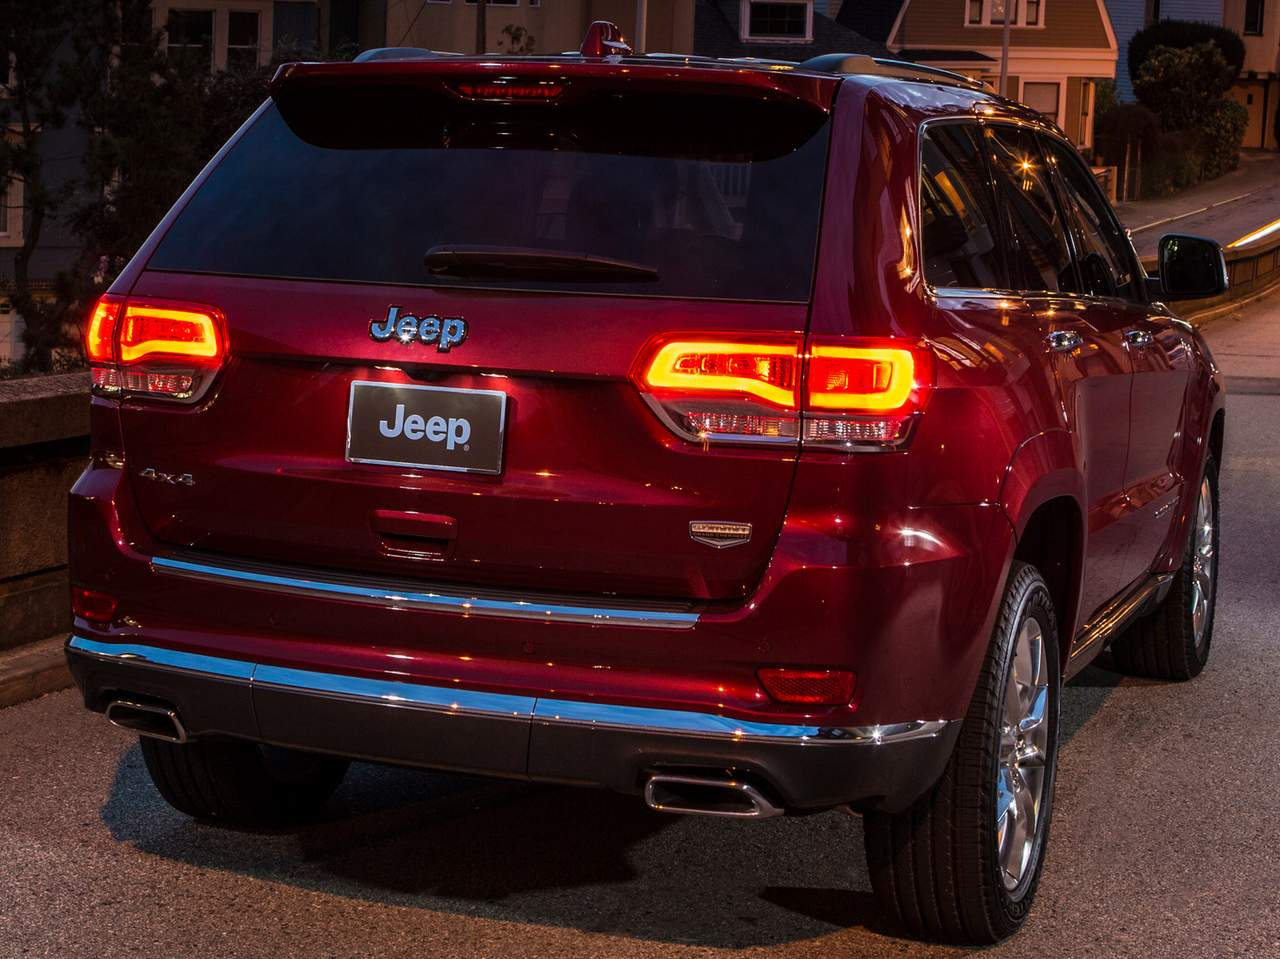 jeep grand cherokee 2014 recall por problema no esp car blog br. Black Bedroom Furniture Sets. Home Design Ideas